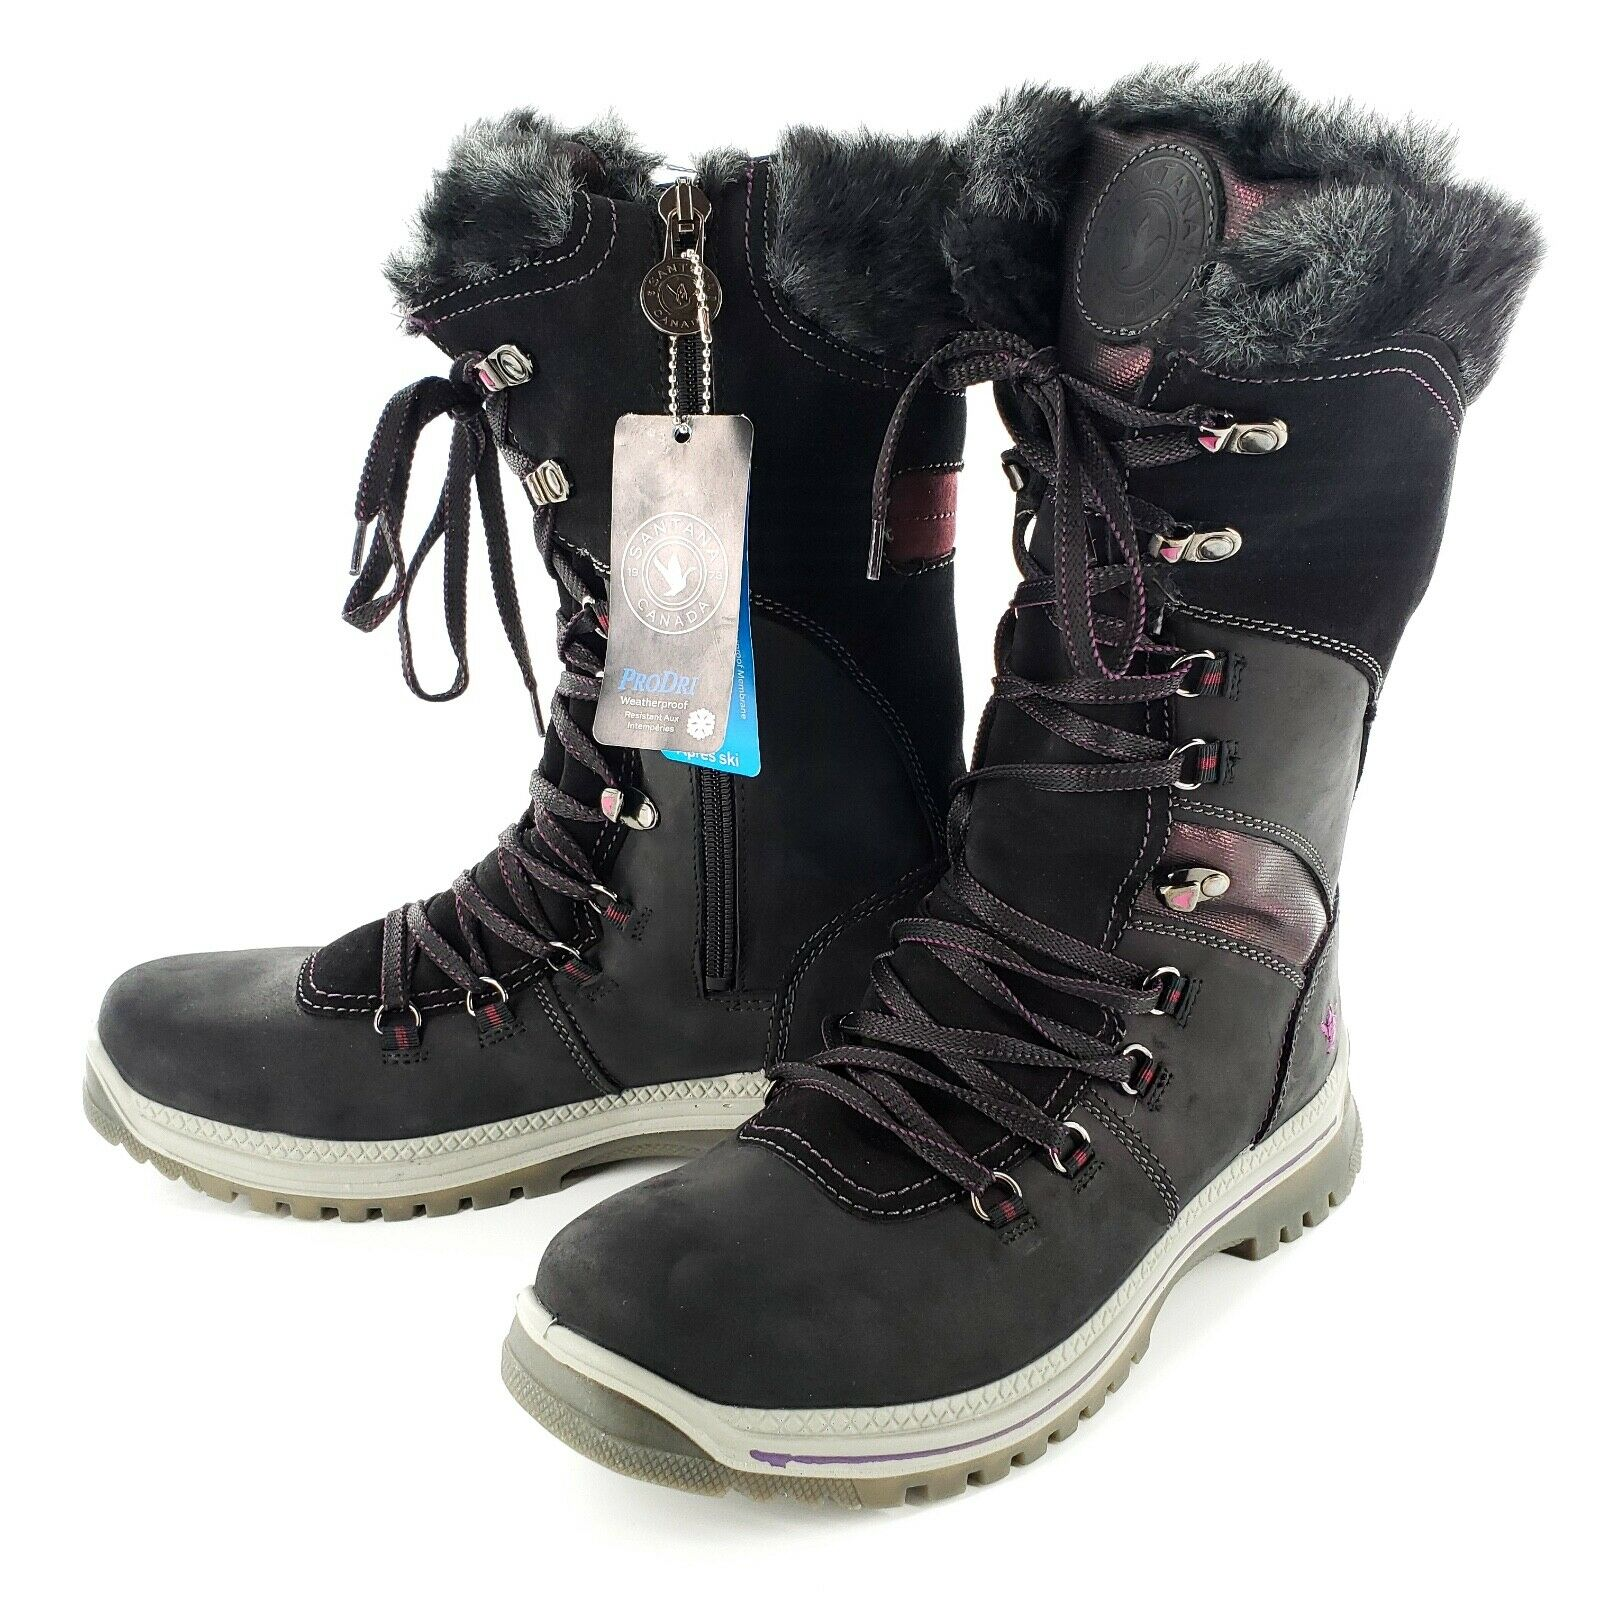 Santana Canada Apres Ski Morella Snow Boots Womens 42/11 Fau